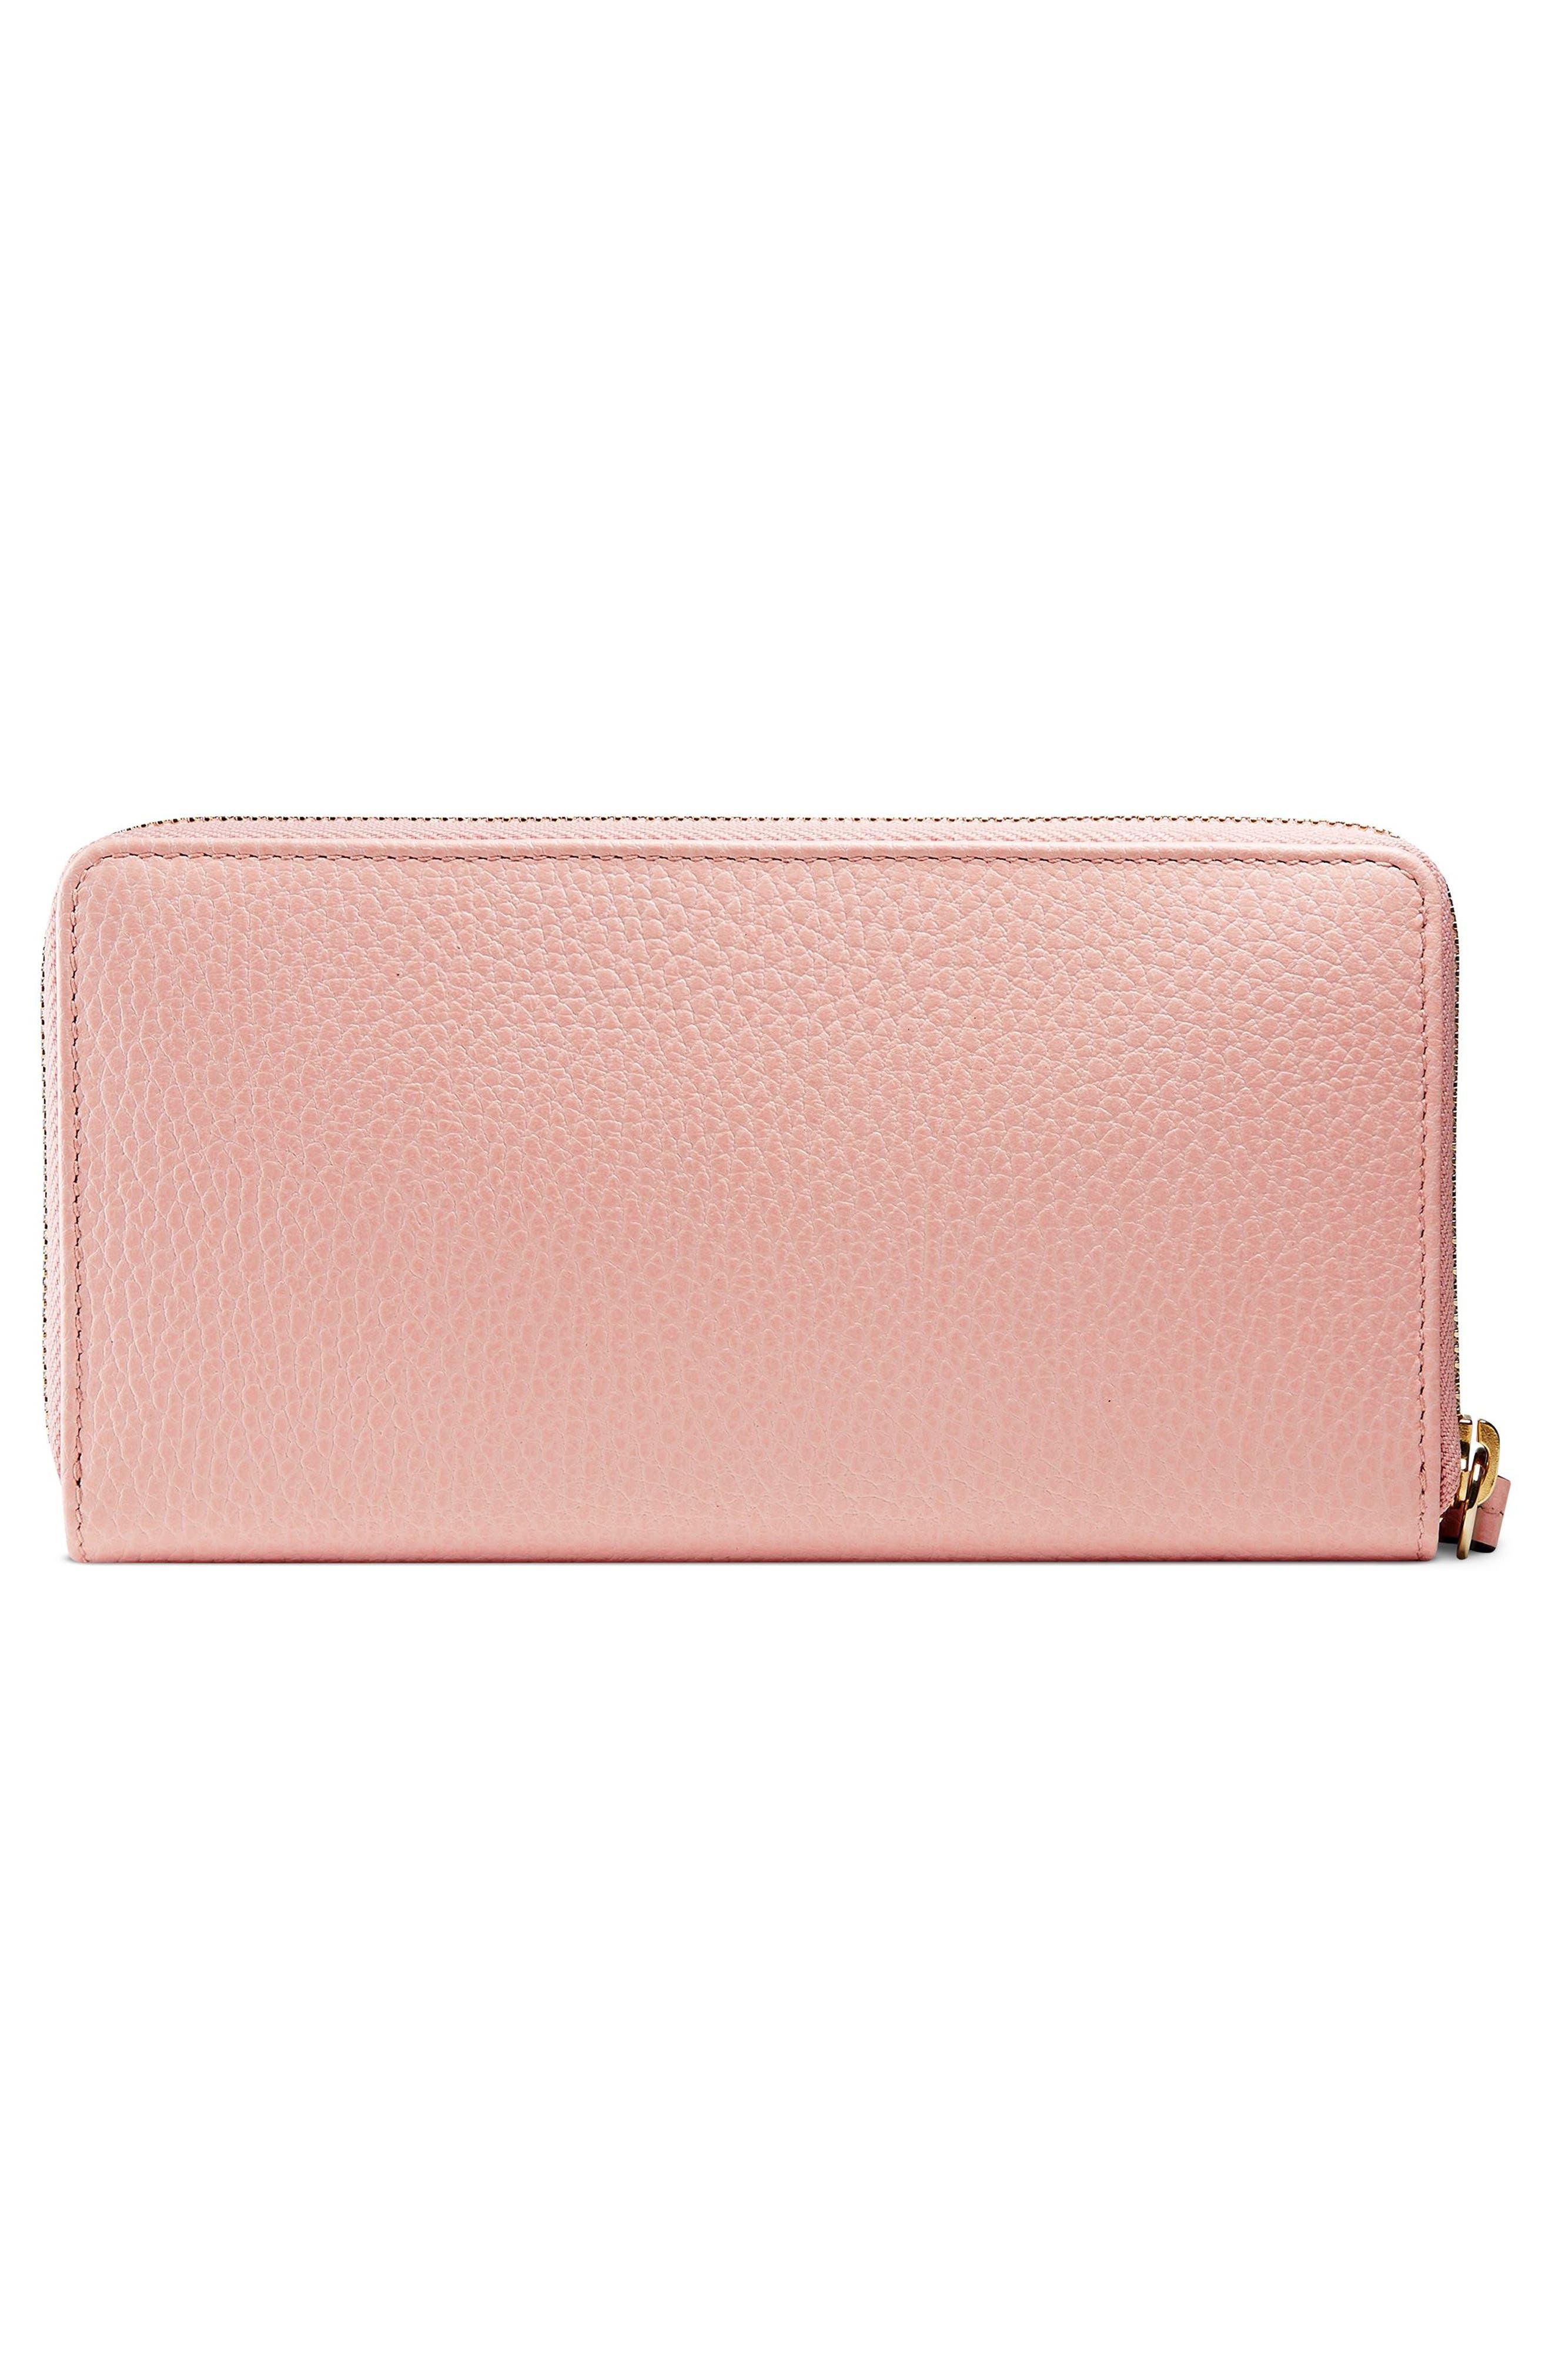 Petite Marmont Leather Zip Around Wallet,                             Alternate thumbnail 3, color,                             650